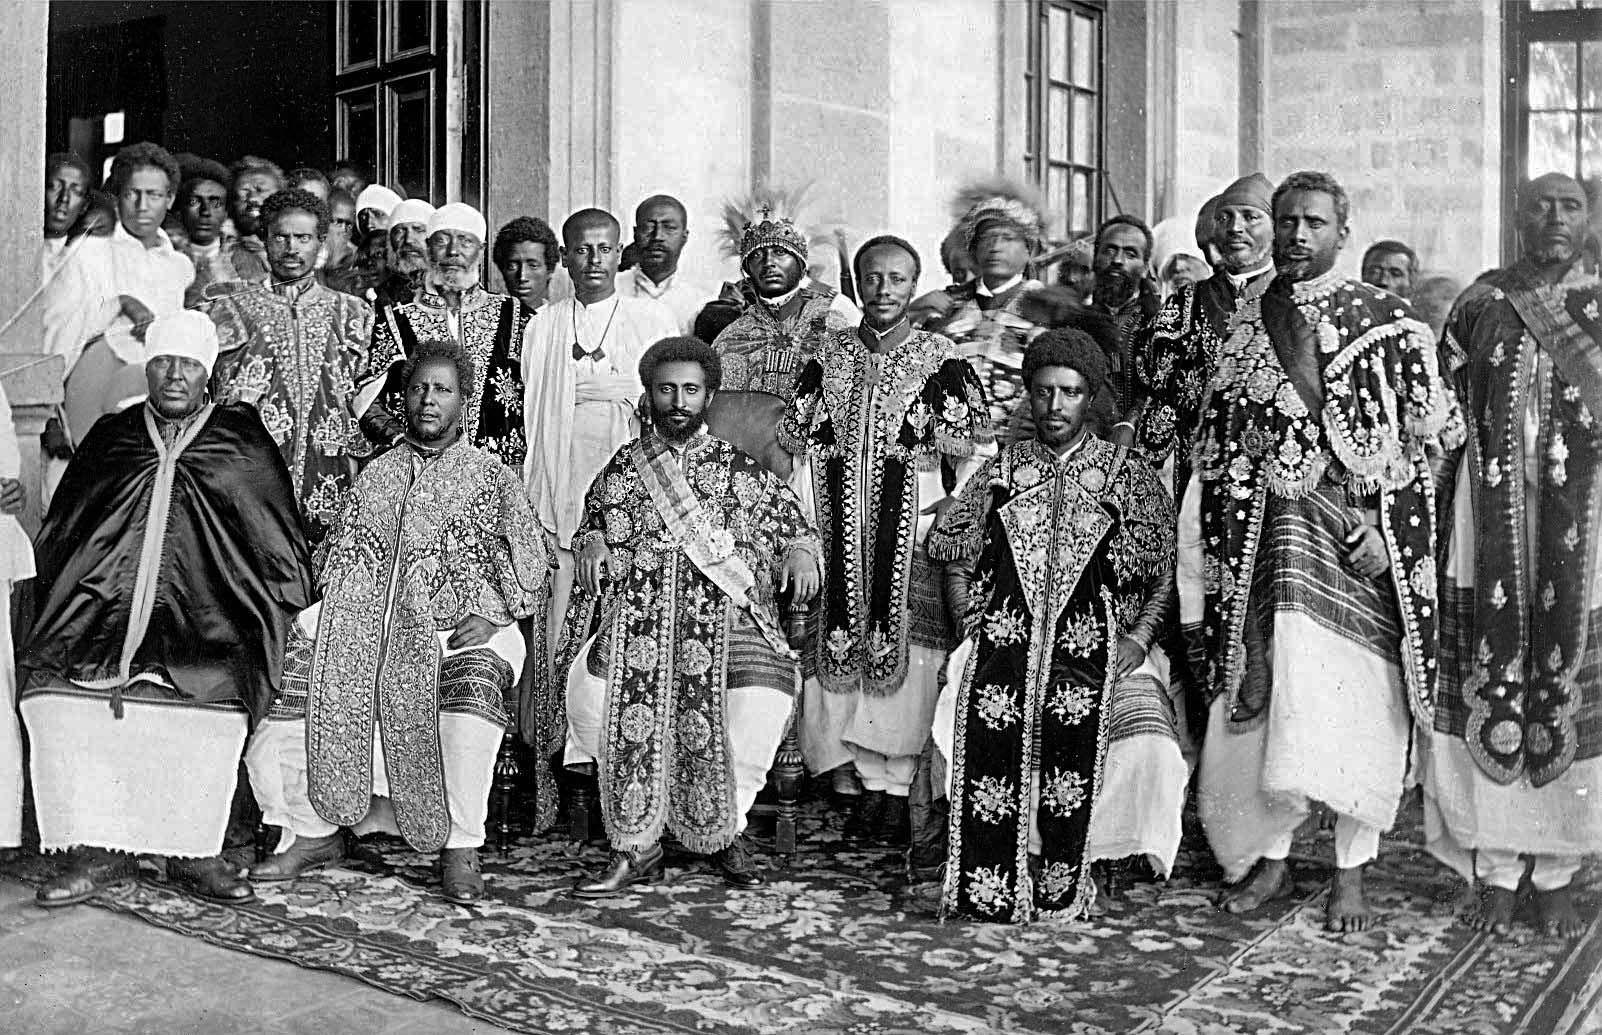 Haile Selassie Of Ethiopia Dies At 83 August 28 1975 African History African Royalty History